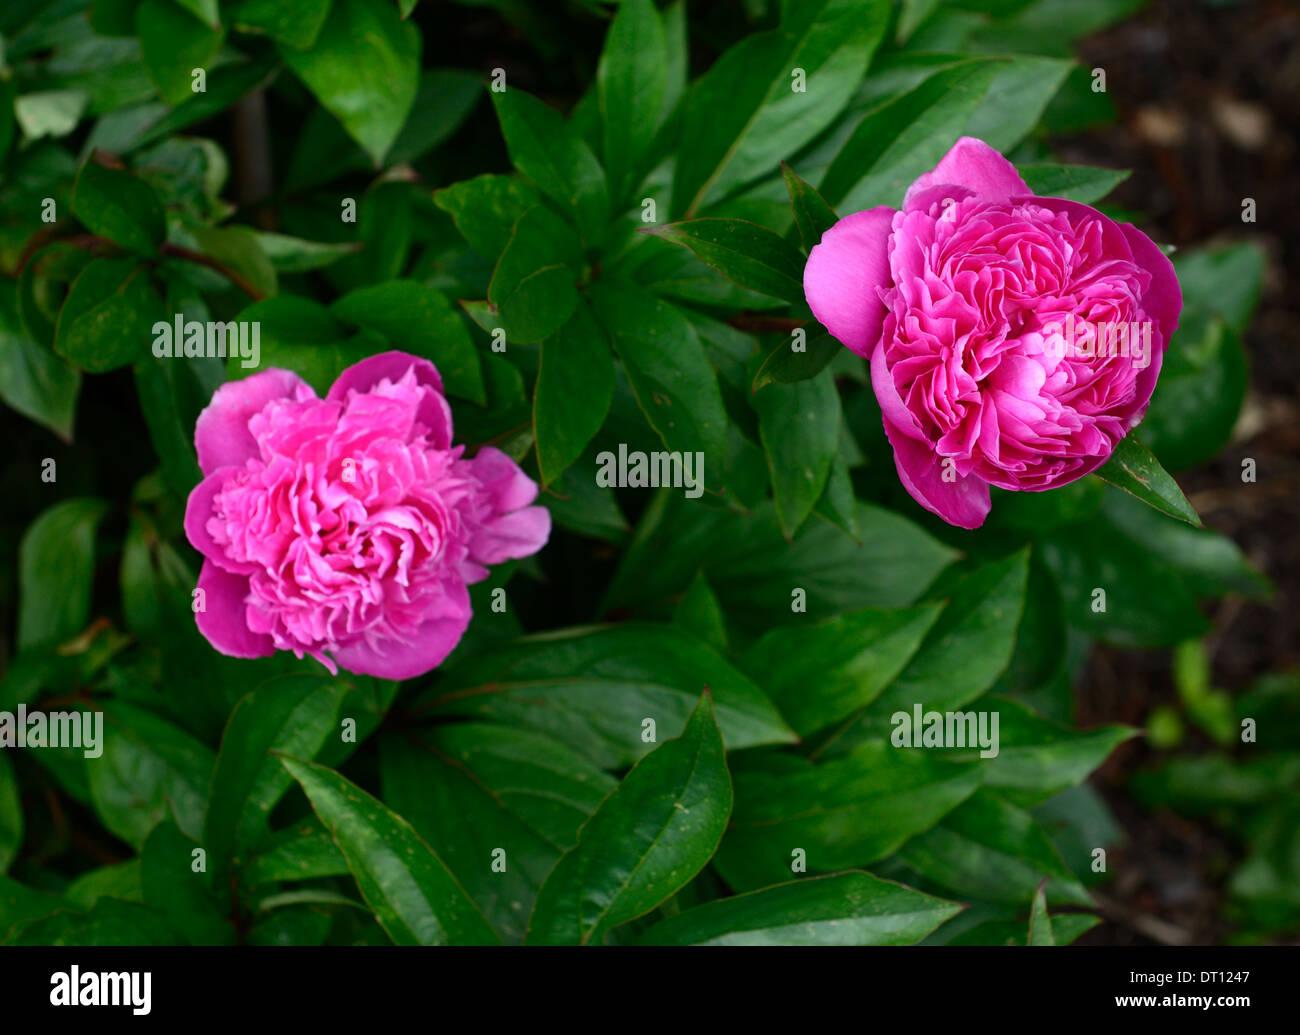 paeonia lactiflora lady alexandra duff peonies peony pink flower flowers perennial herbaceous - Stock Image